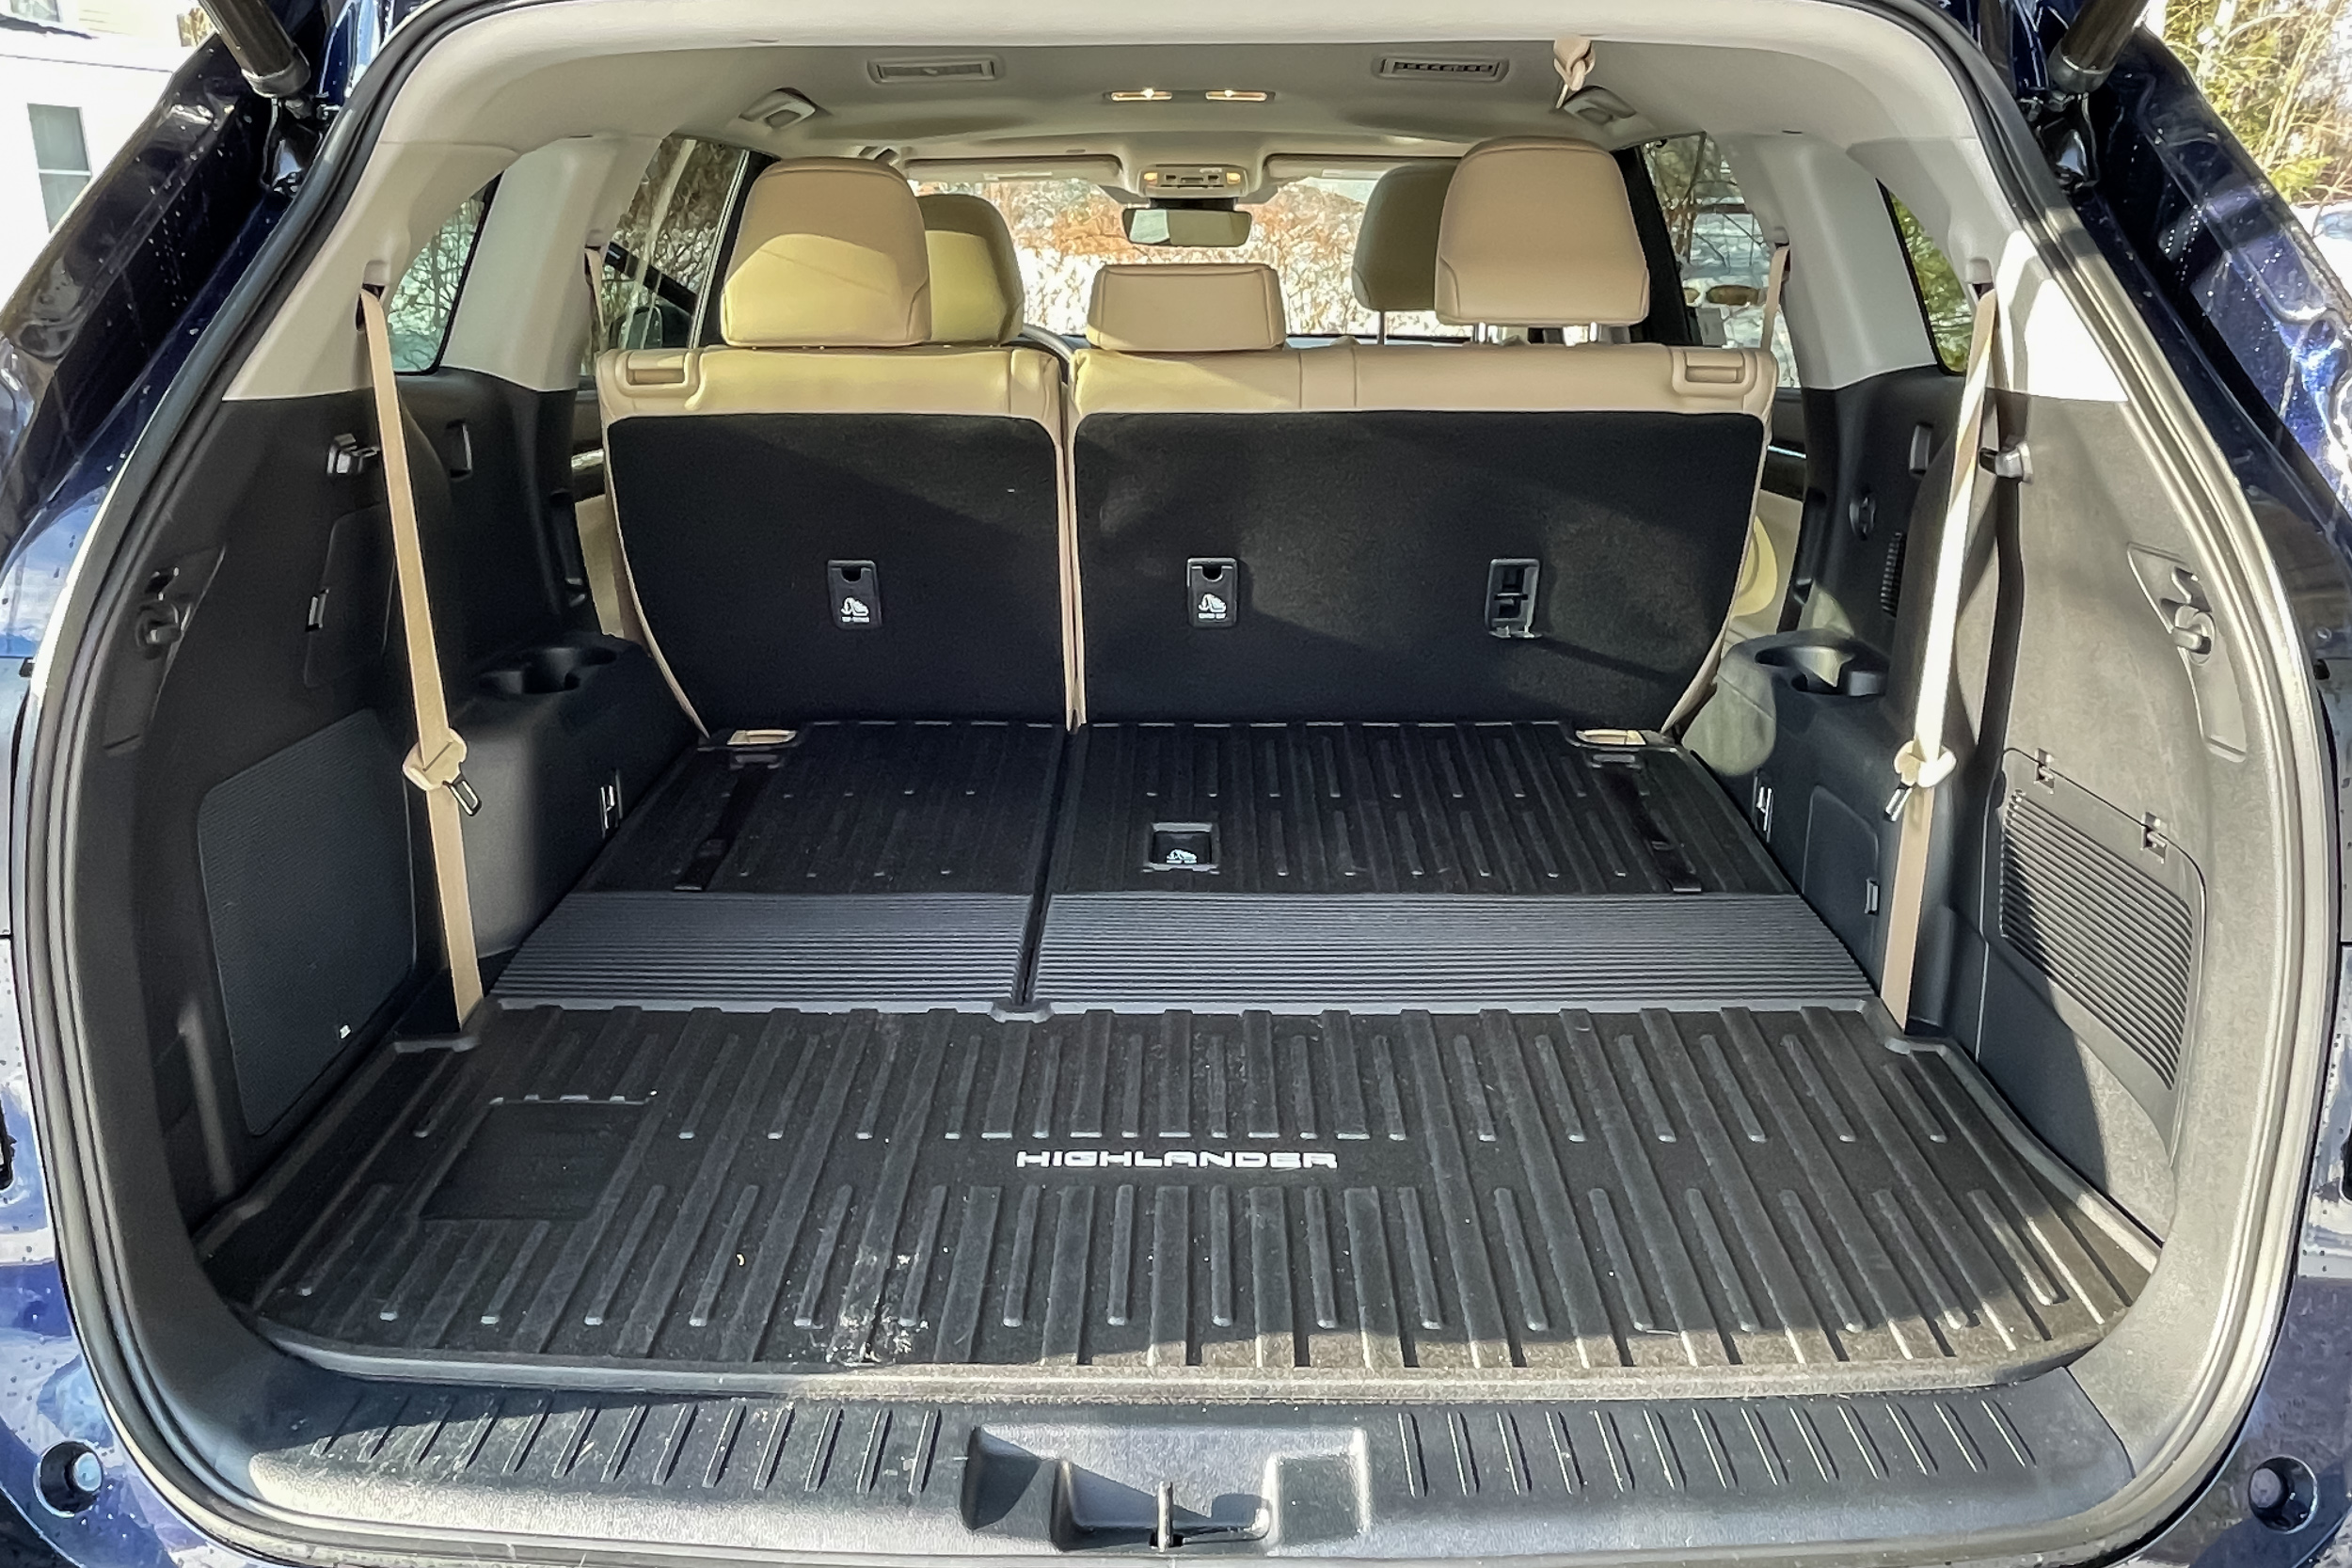 2021 Toyota Highlander Limited cargo area